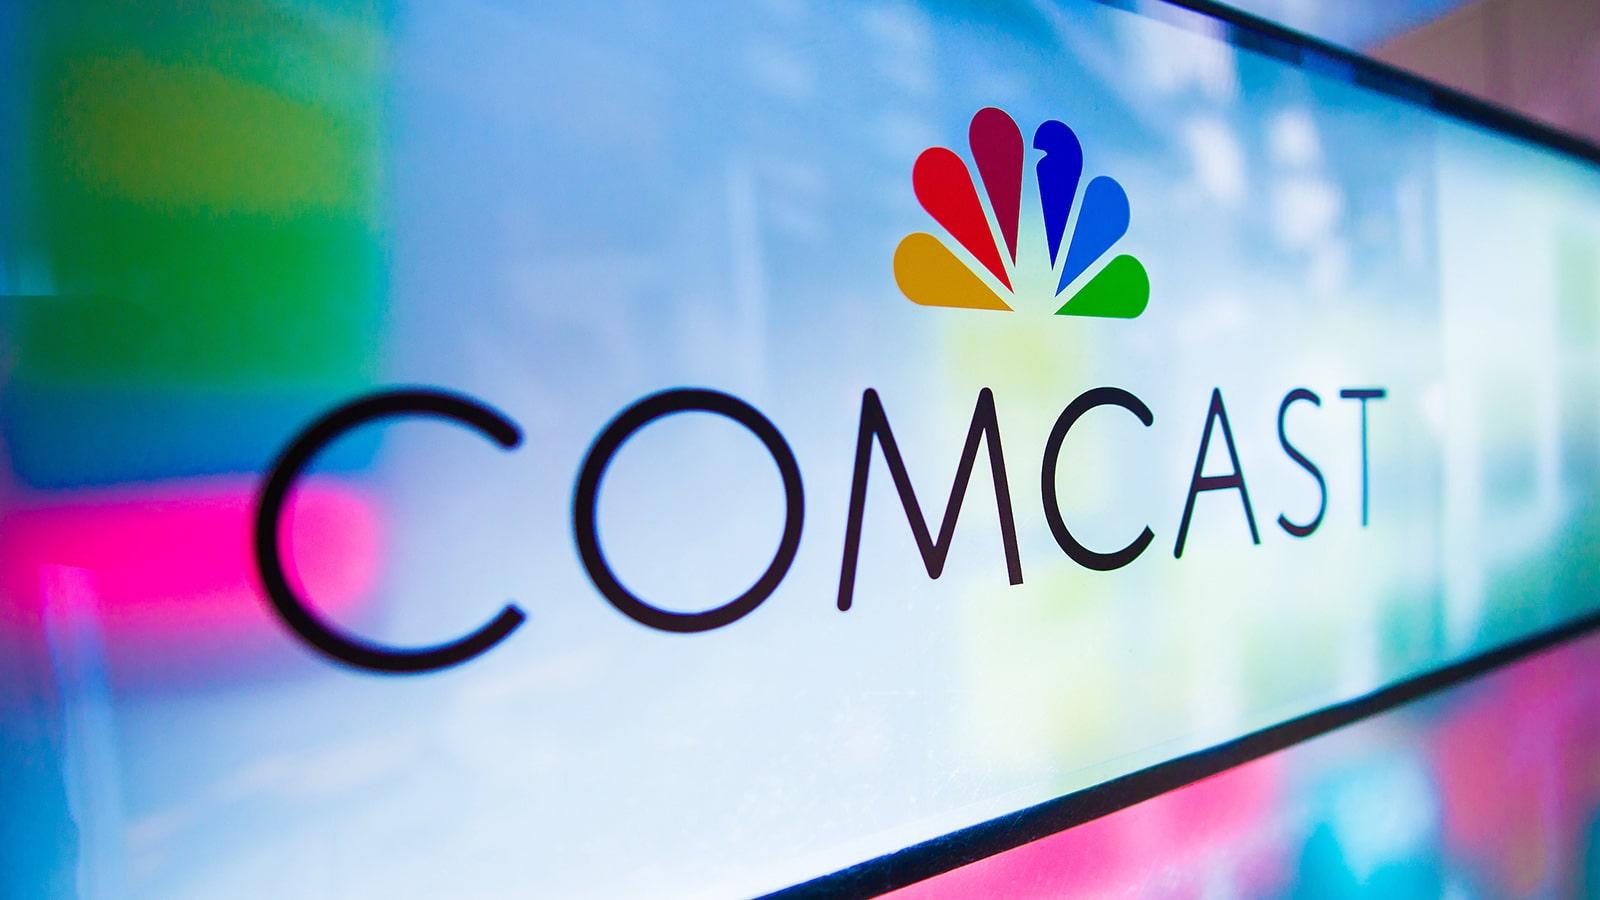 How to Call Comcast Customer Service